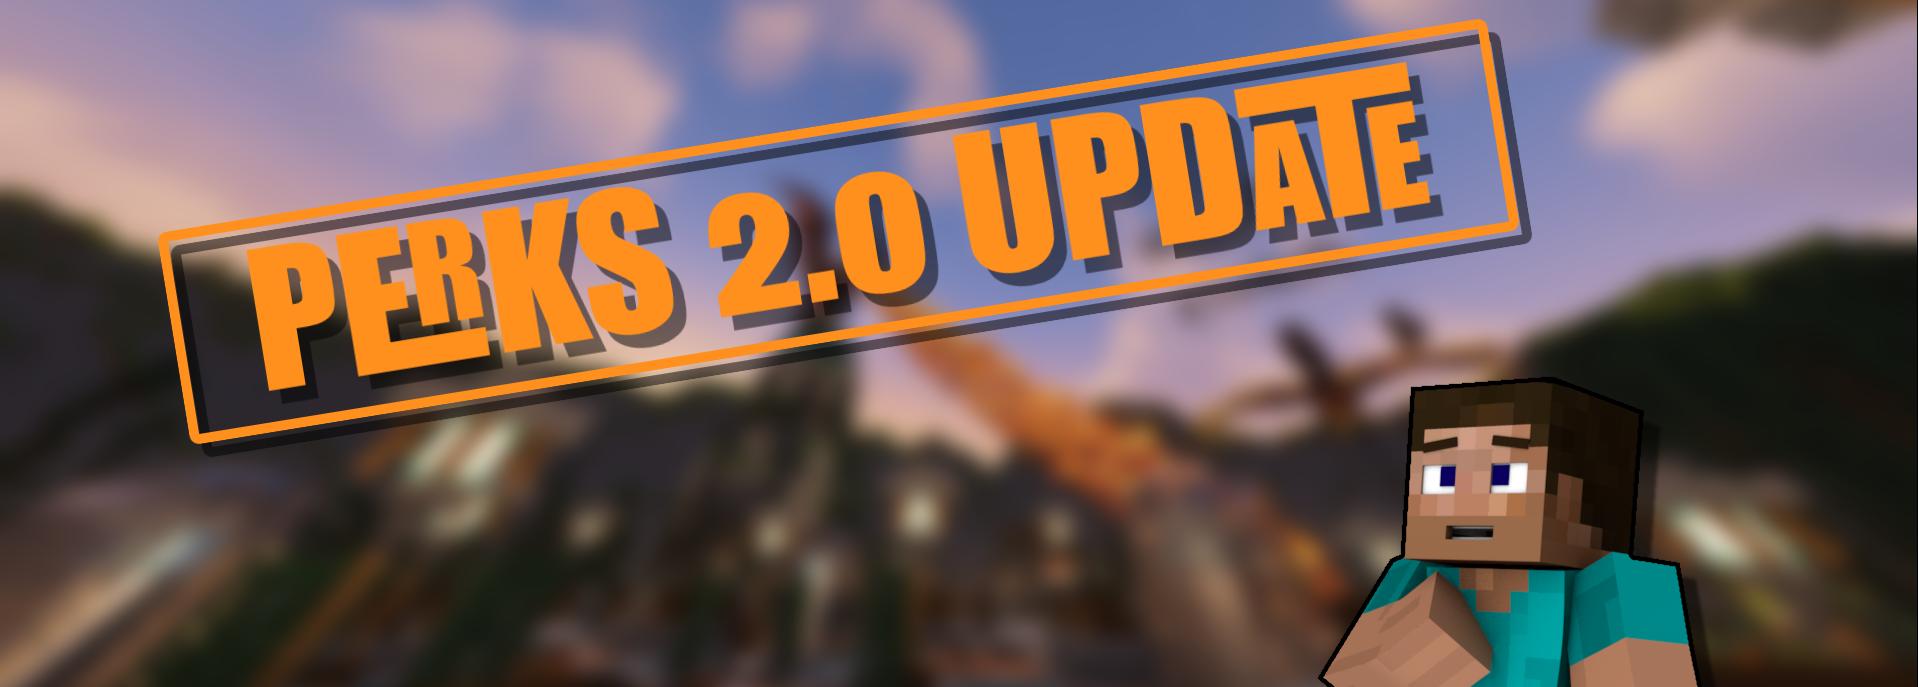 perks_update.png